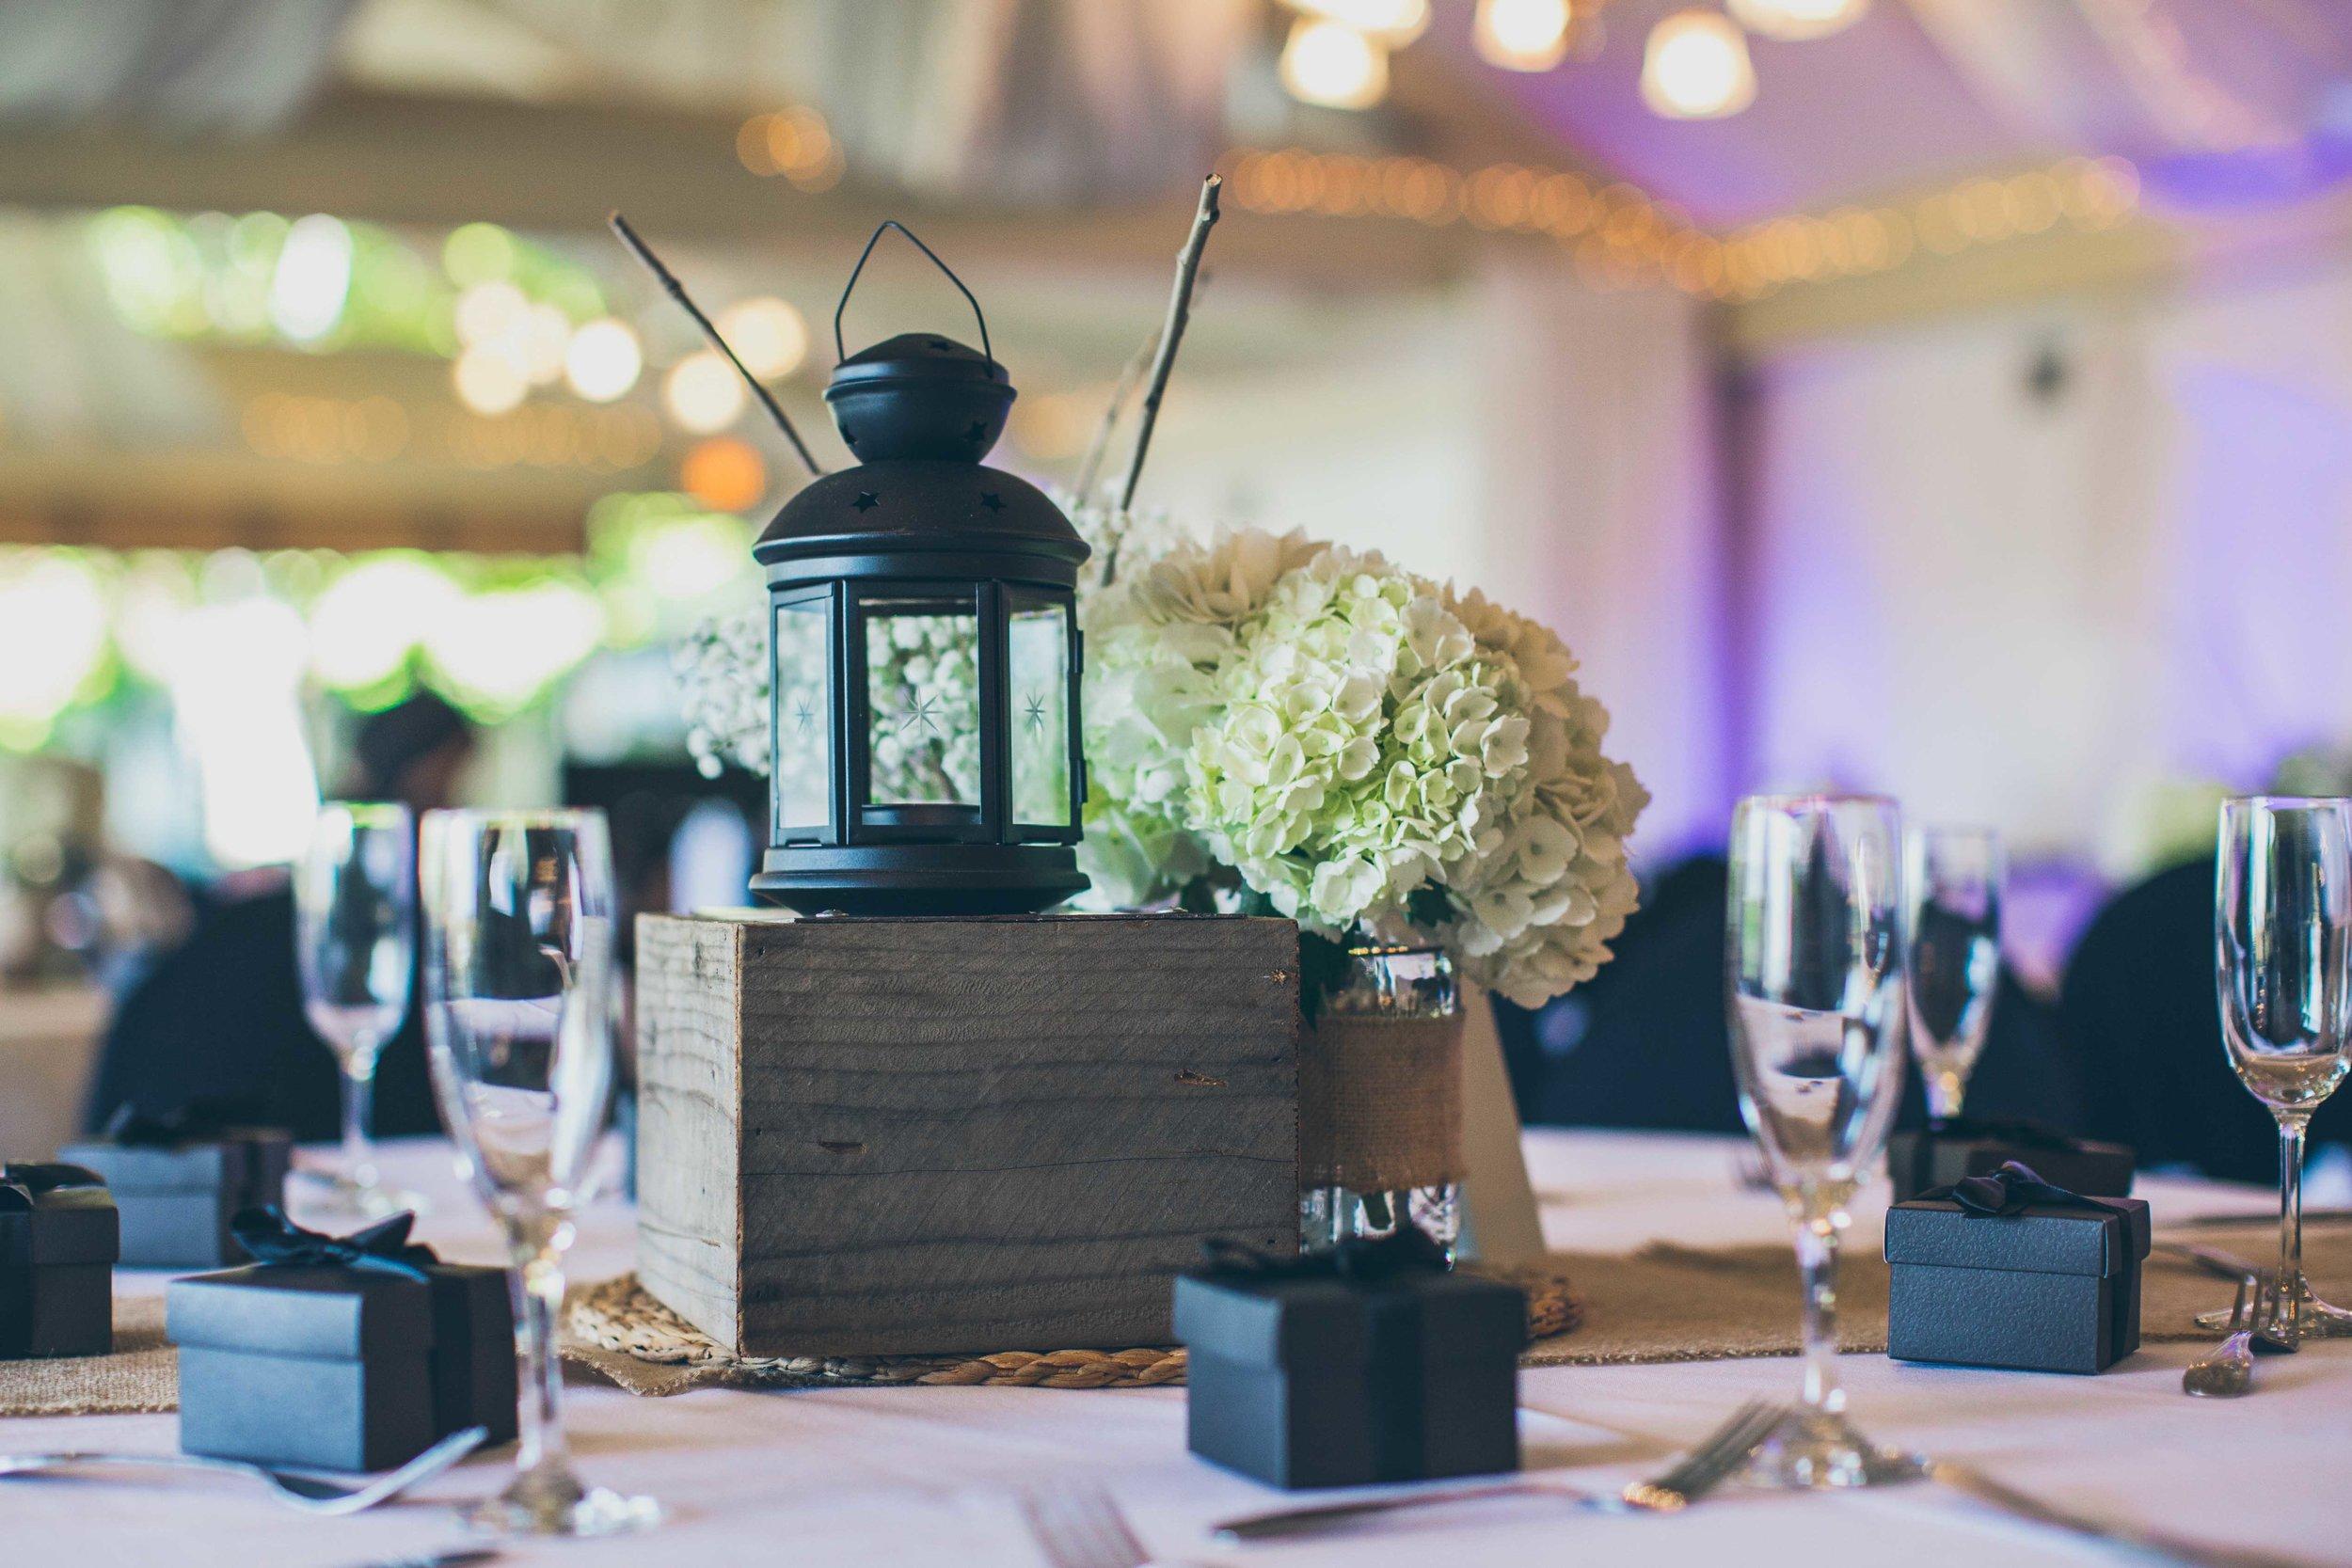 APavone-Photographer-Orange-County-Diamond-Bar-Wedding-020.jpg